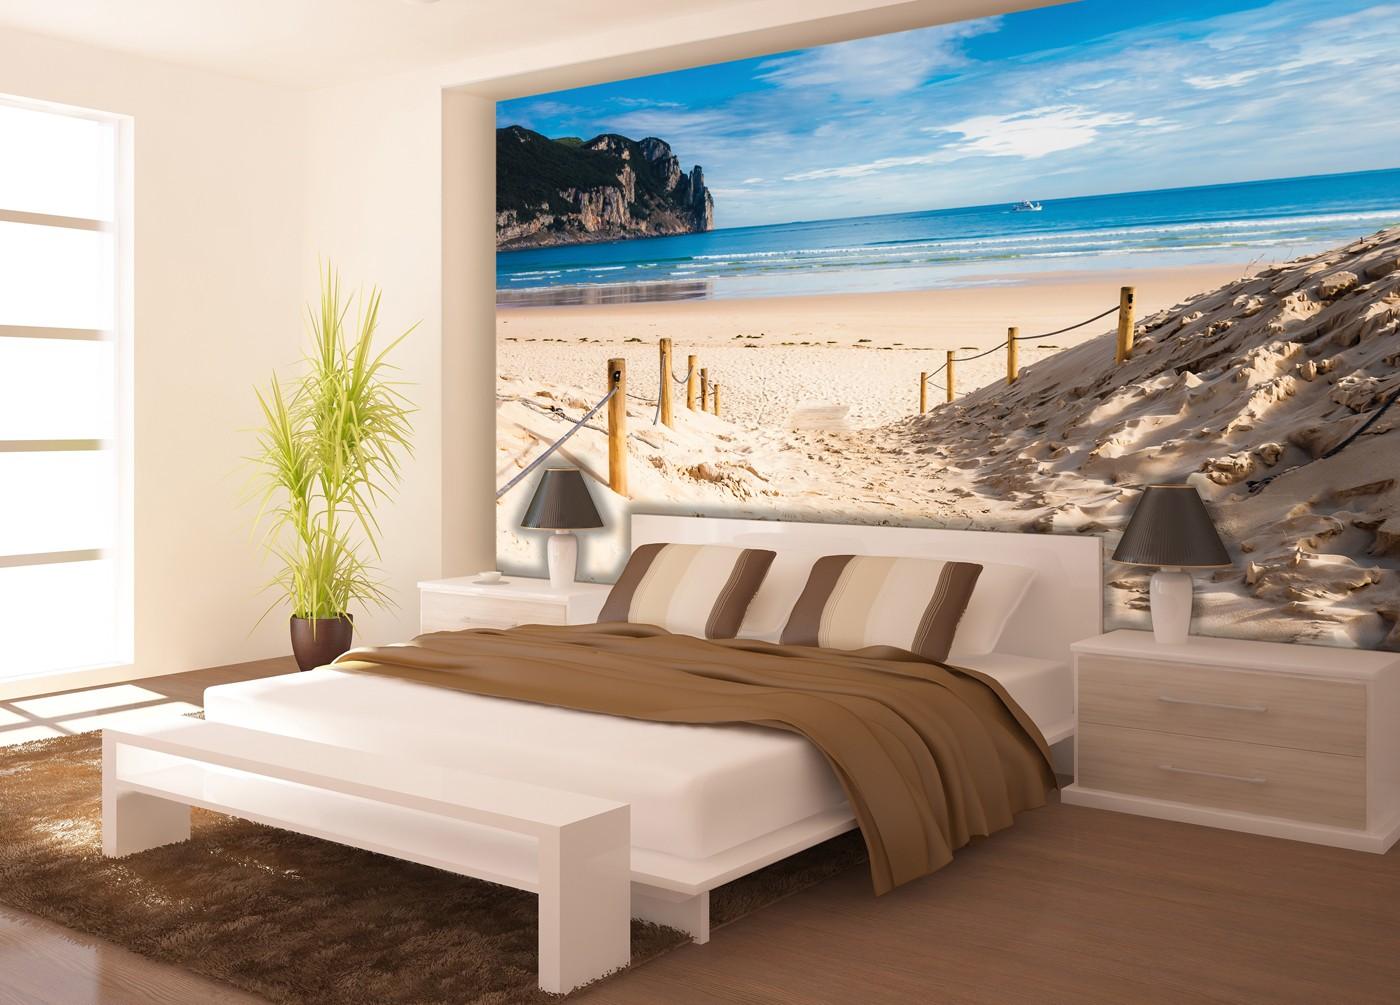 Fototapet duplex Sands Beach 2281P8 368 x 254 cm